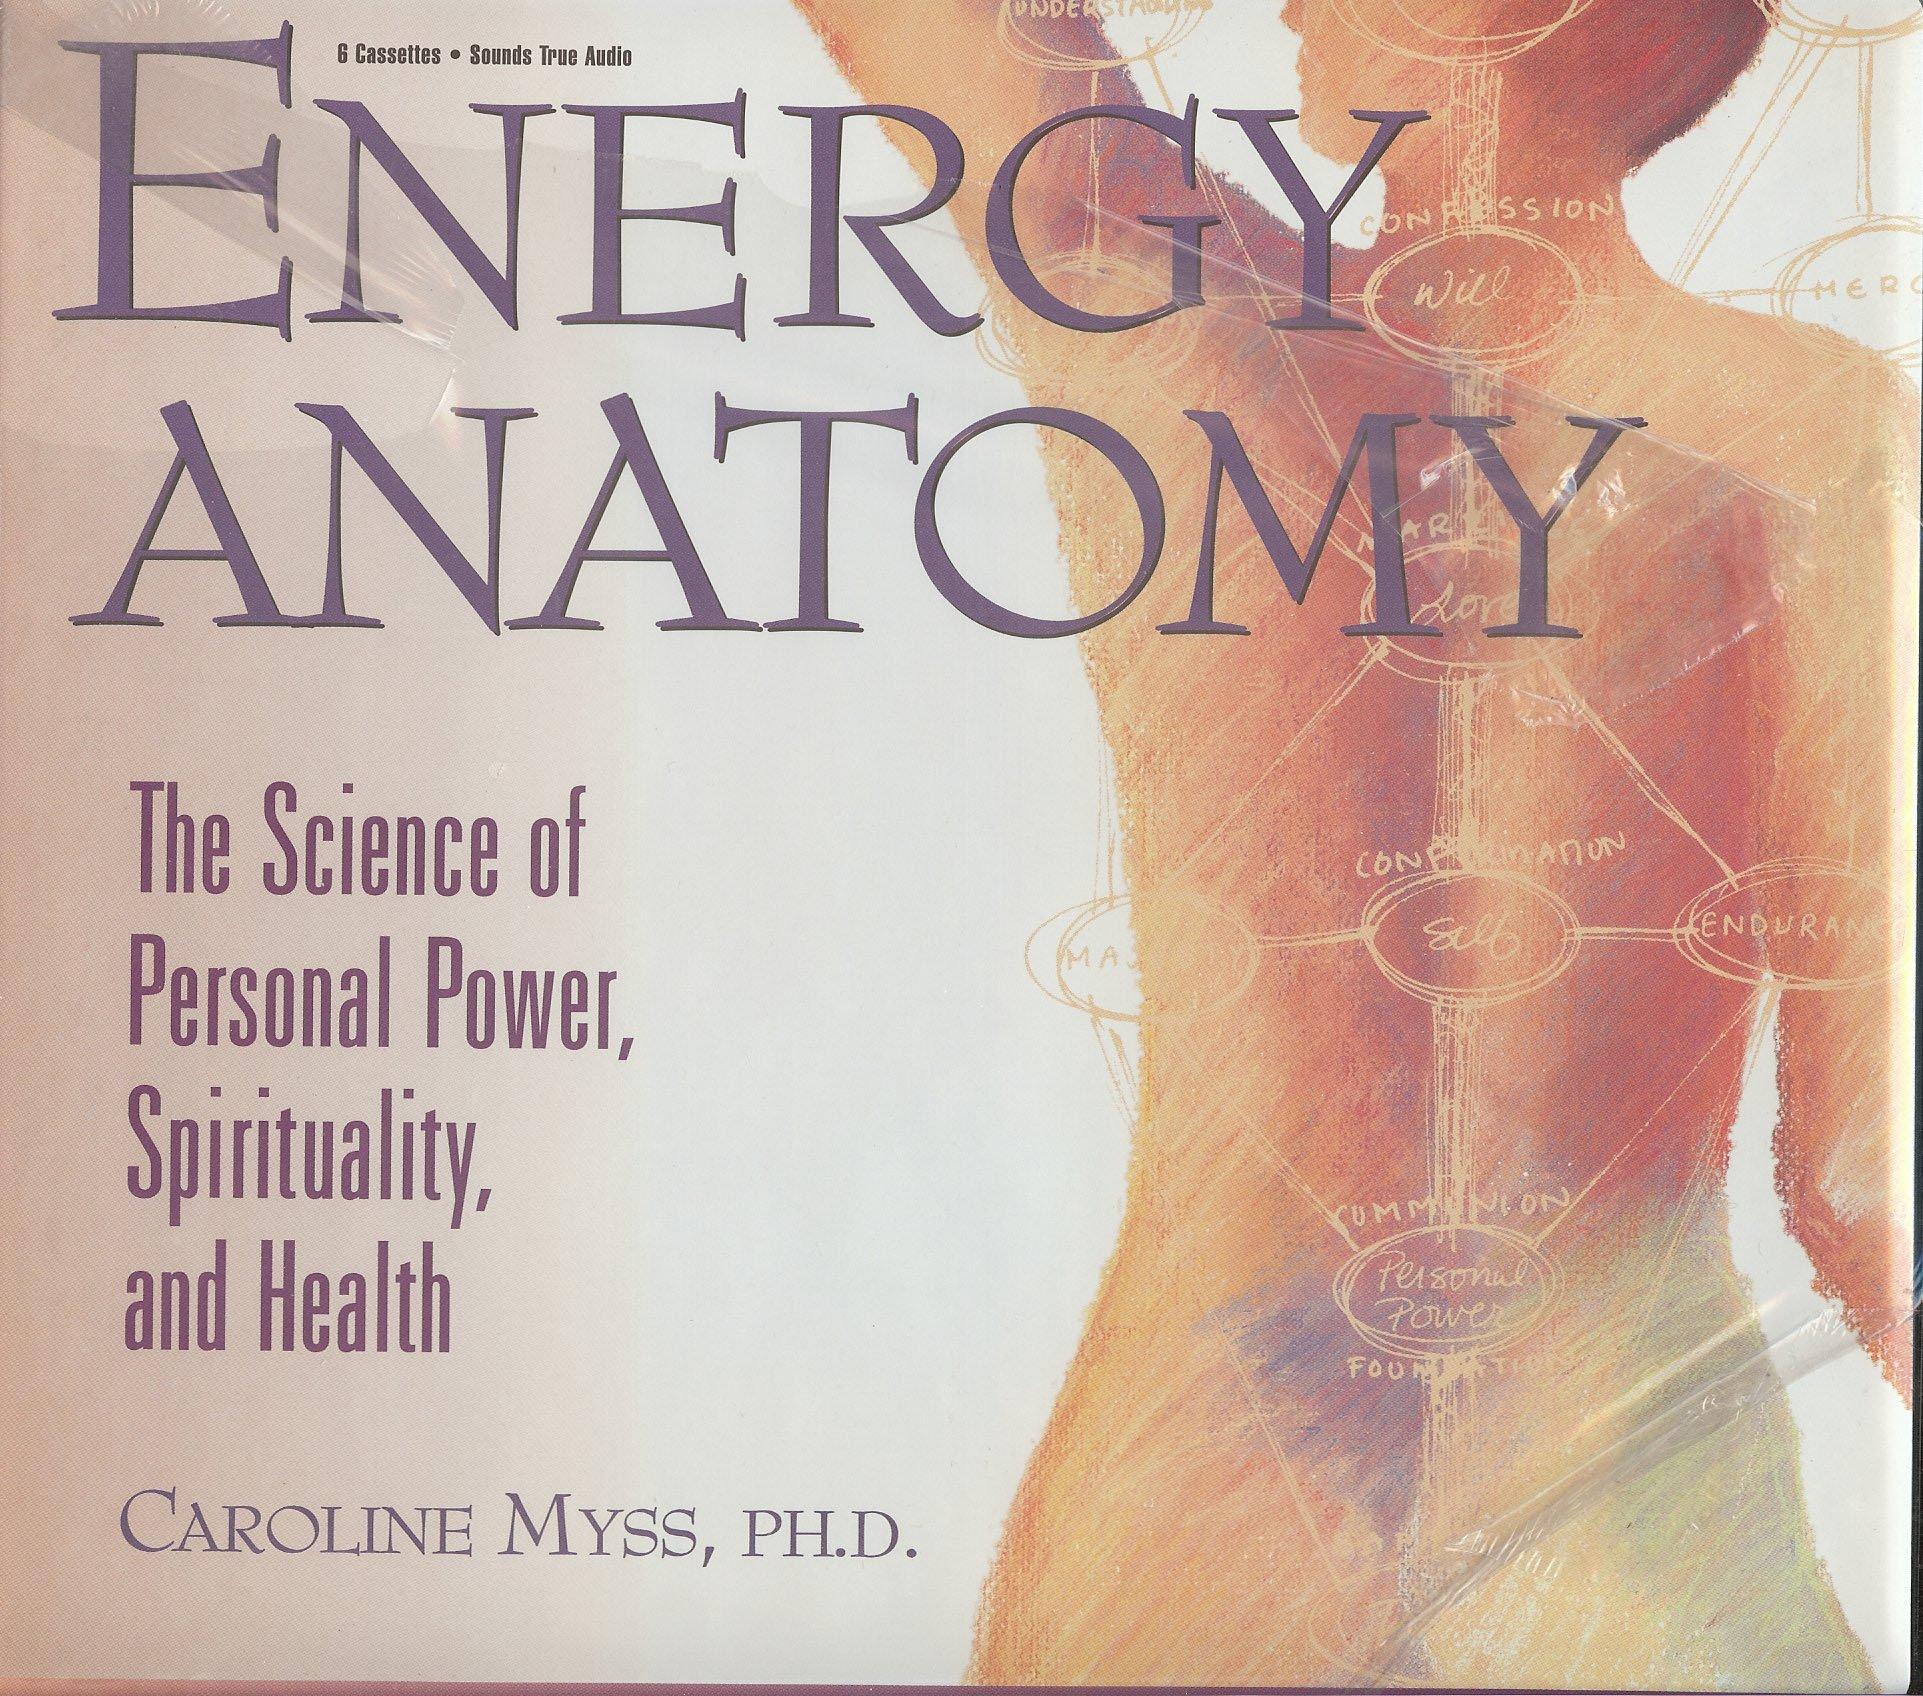 Energy Anatomy: PhD Caroline Myss: Amazon.com: Books